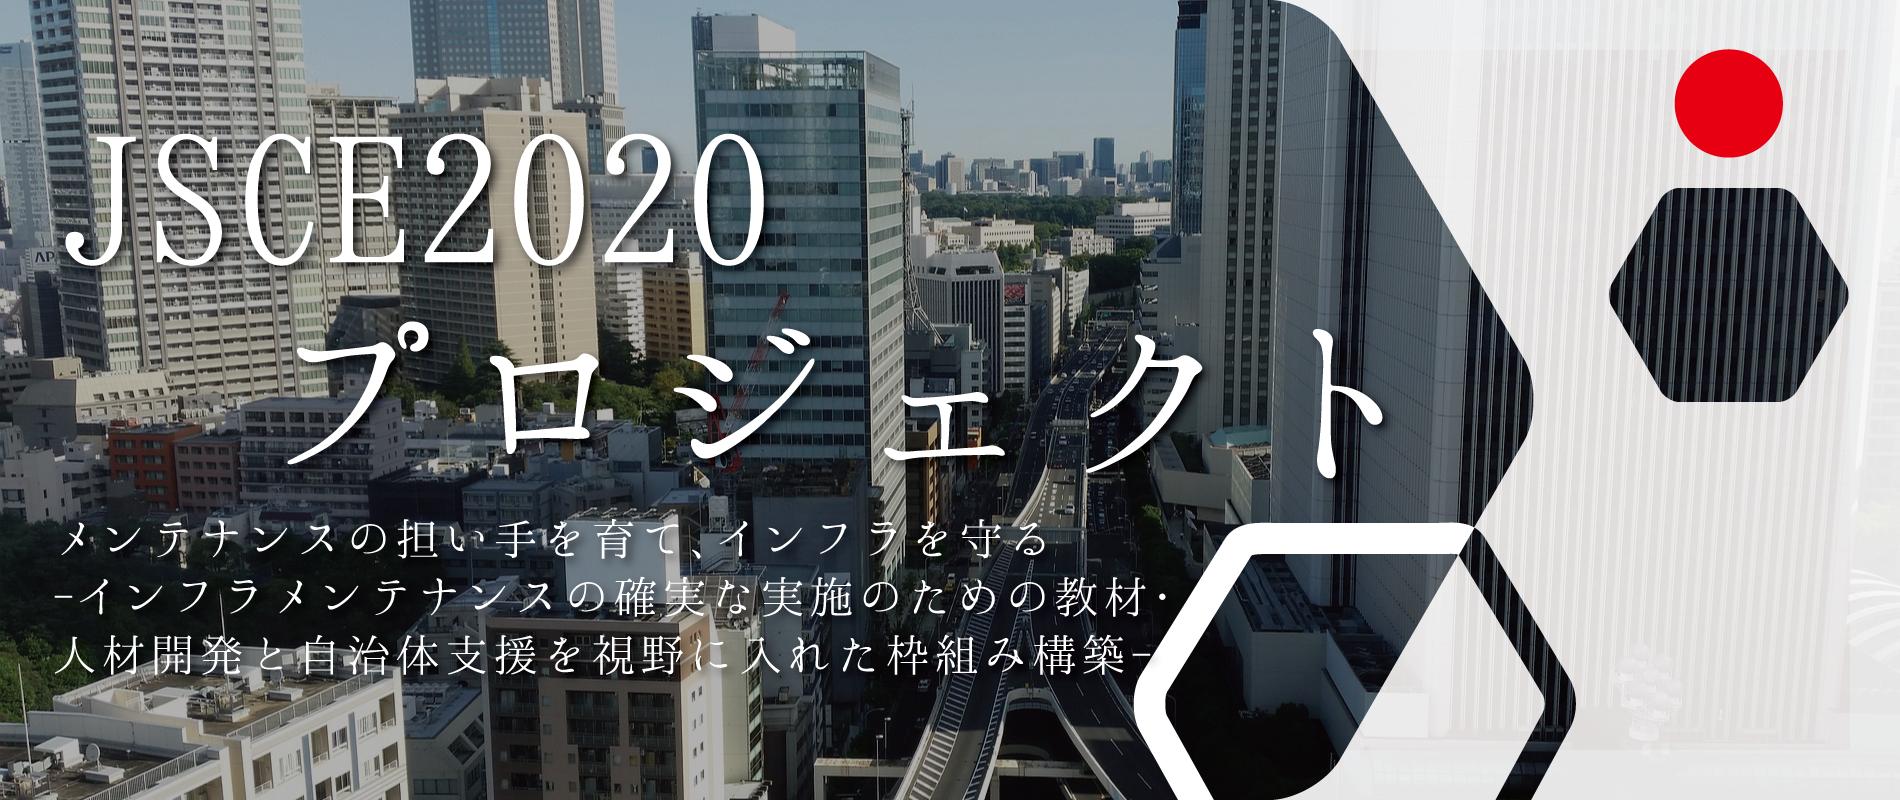 JSCE2020プロジェクト